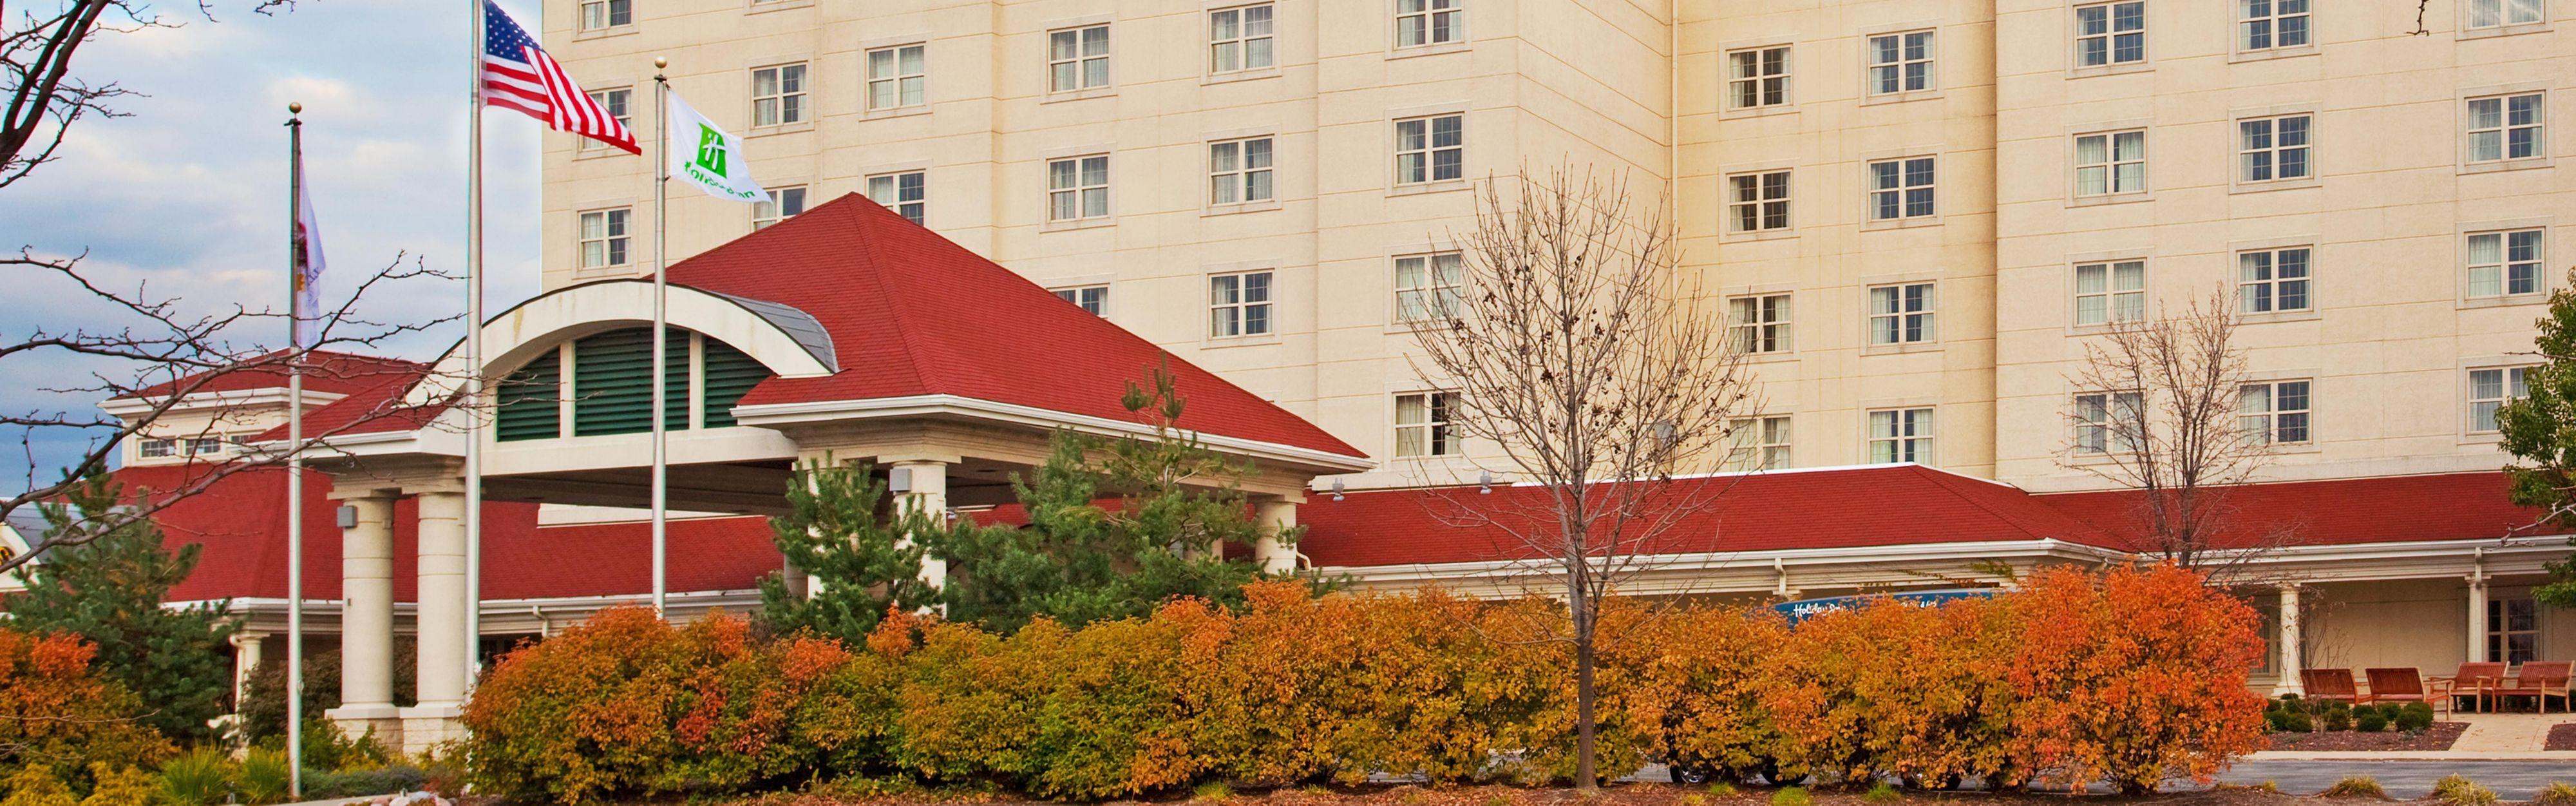 Holiday Inn Chicago-Tinley Park-Conv Ctr image 0